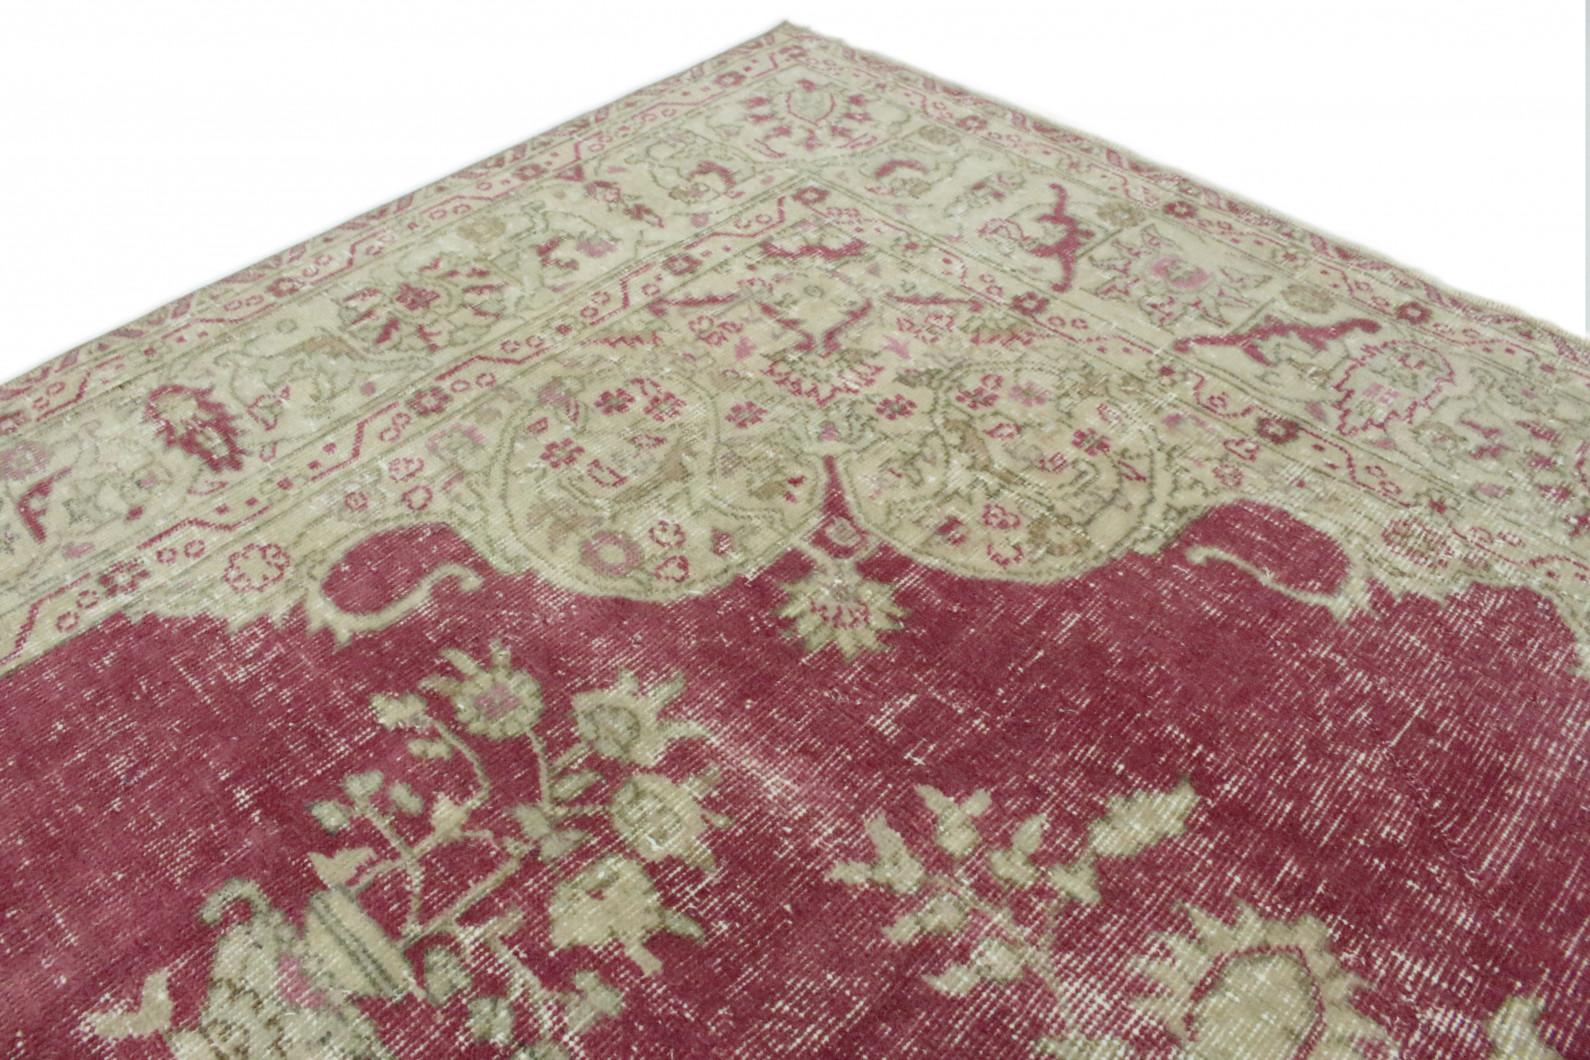 vintage teppich beige rot in 300x200 1011 1292 bei. Black Bedroom Furniture Sets. Home Design Ideas